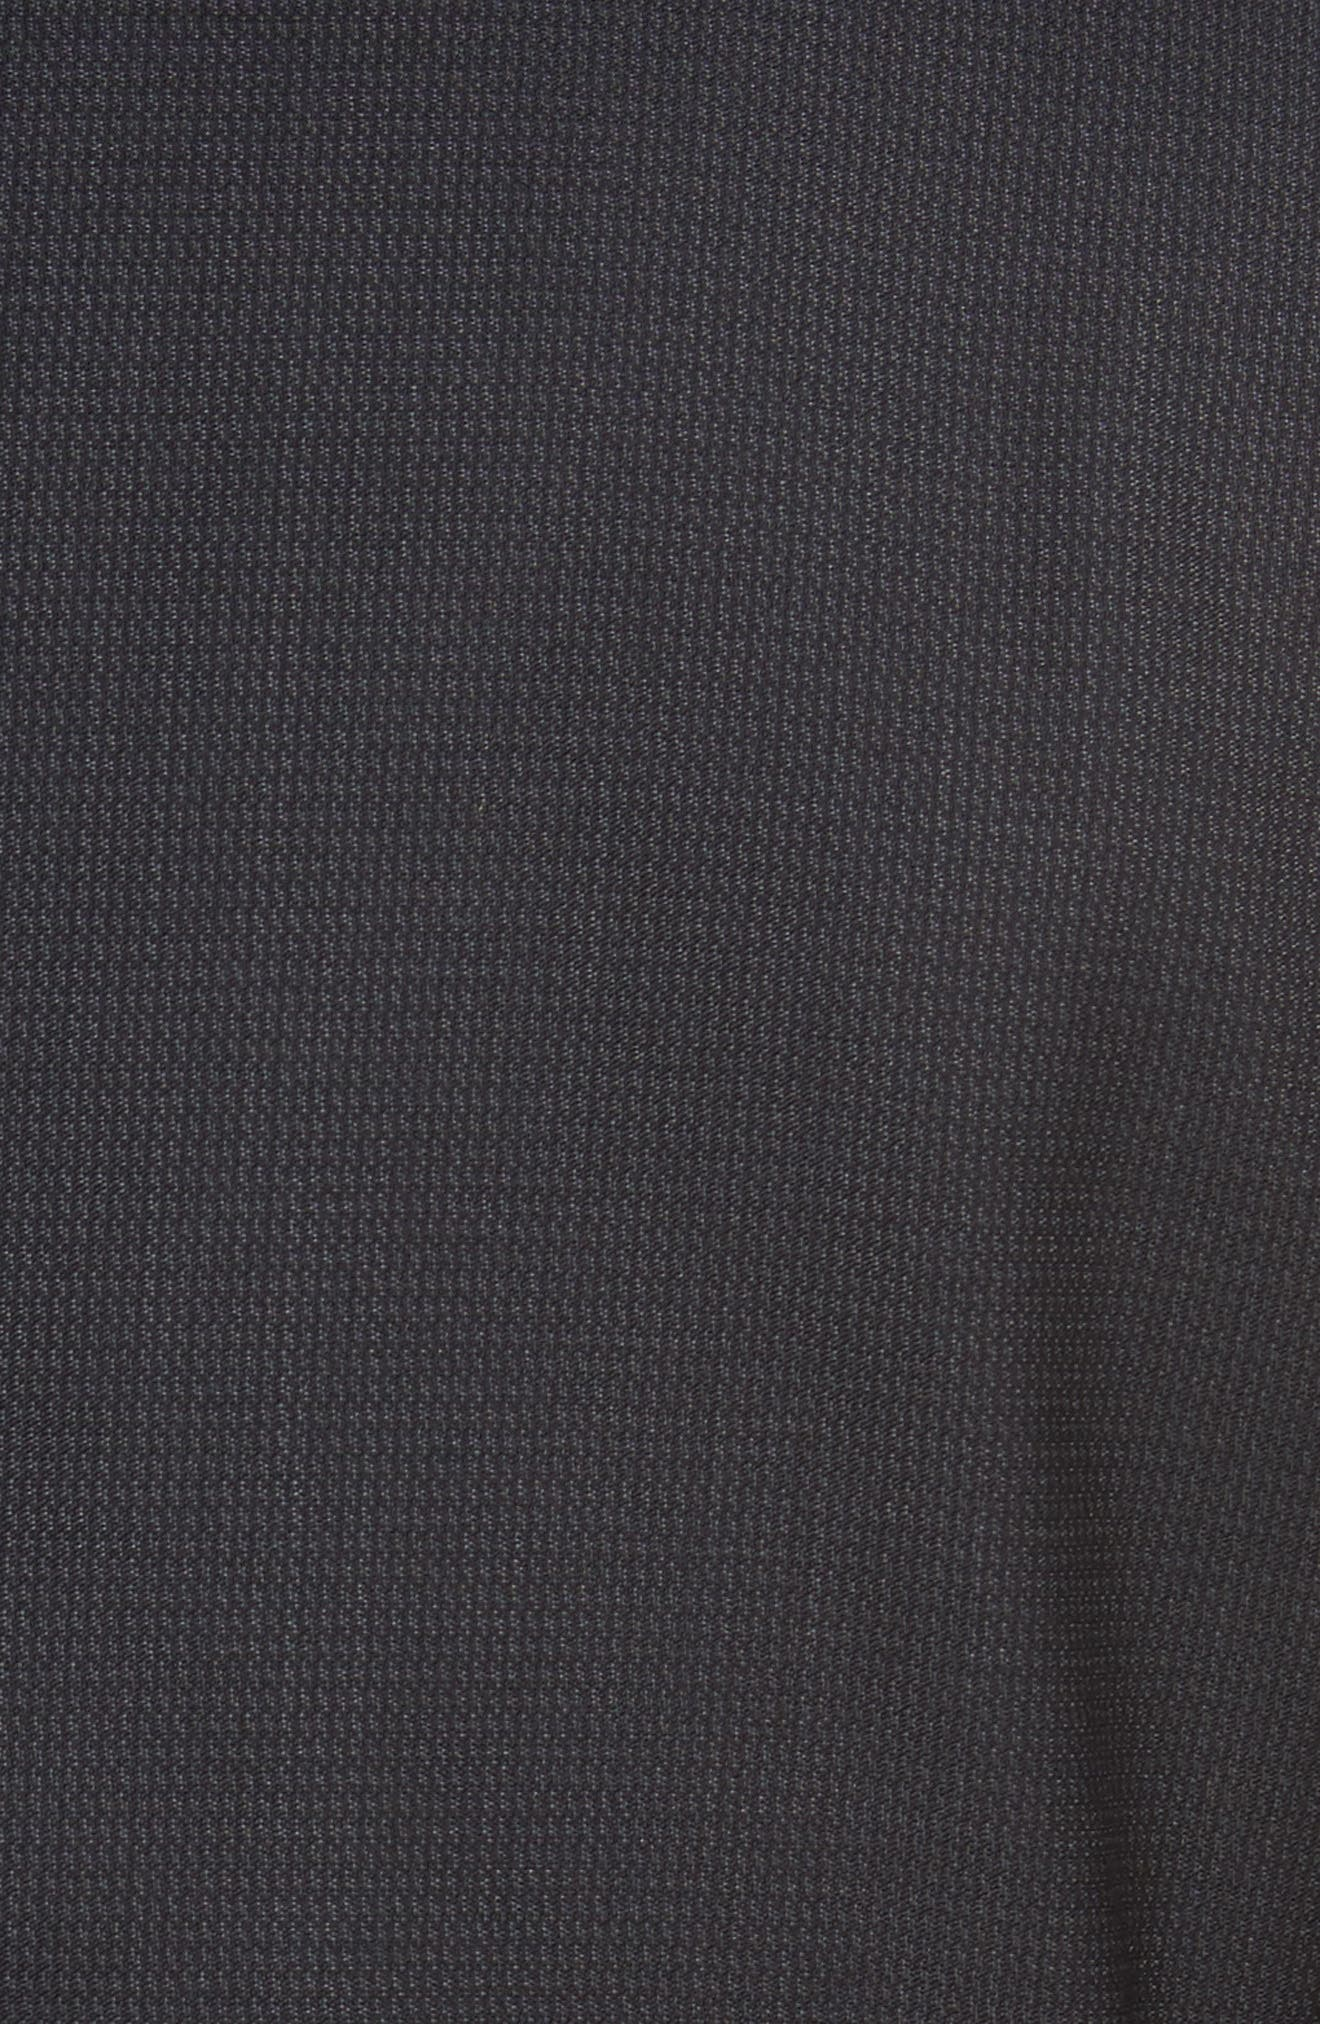 Roger Trim Fit Solid Wool Suit,                             Alternate thumbnail 7, color,                             001